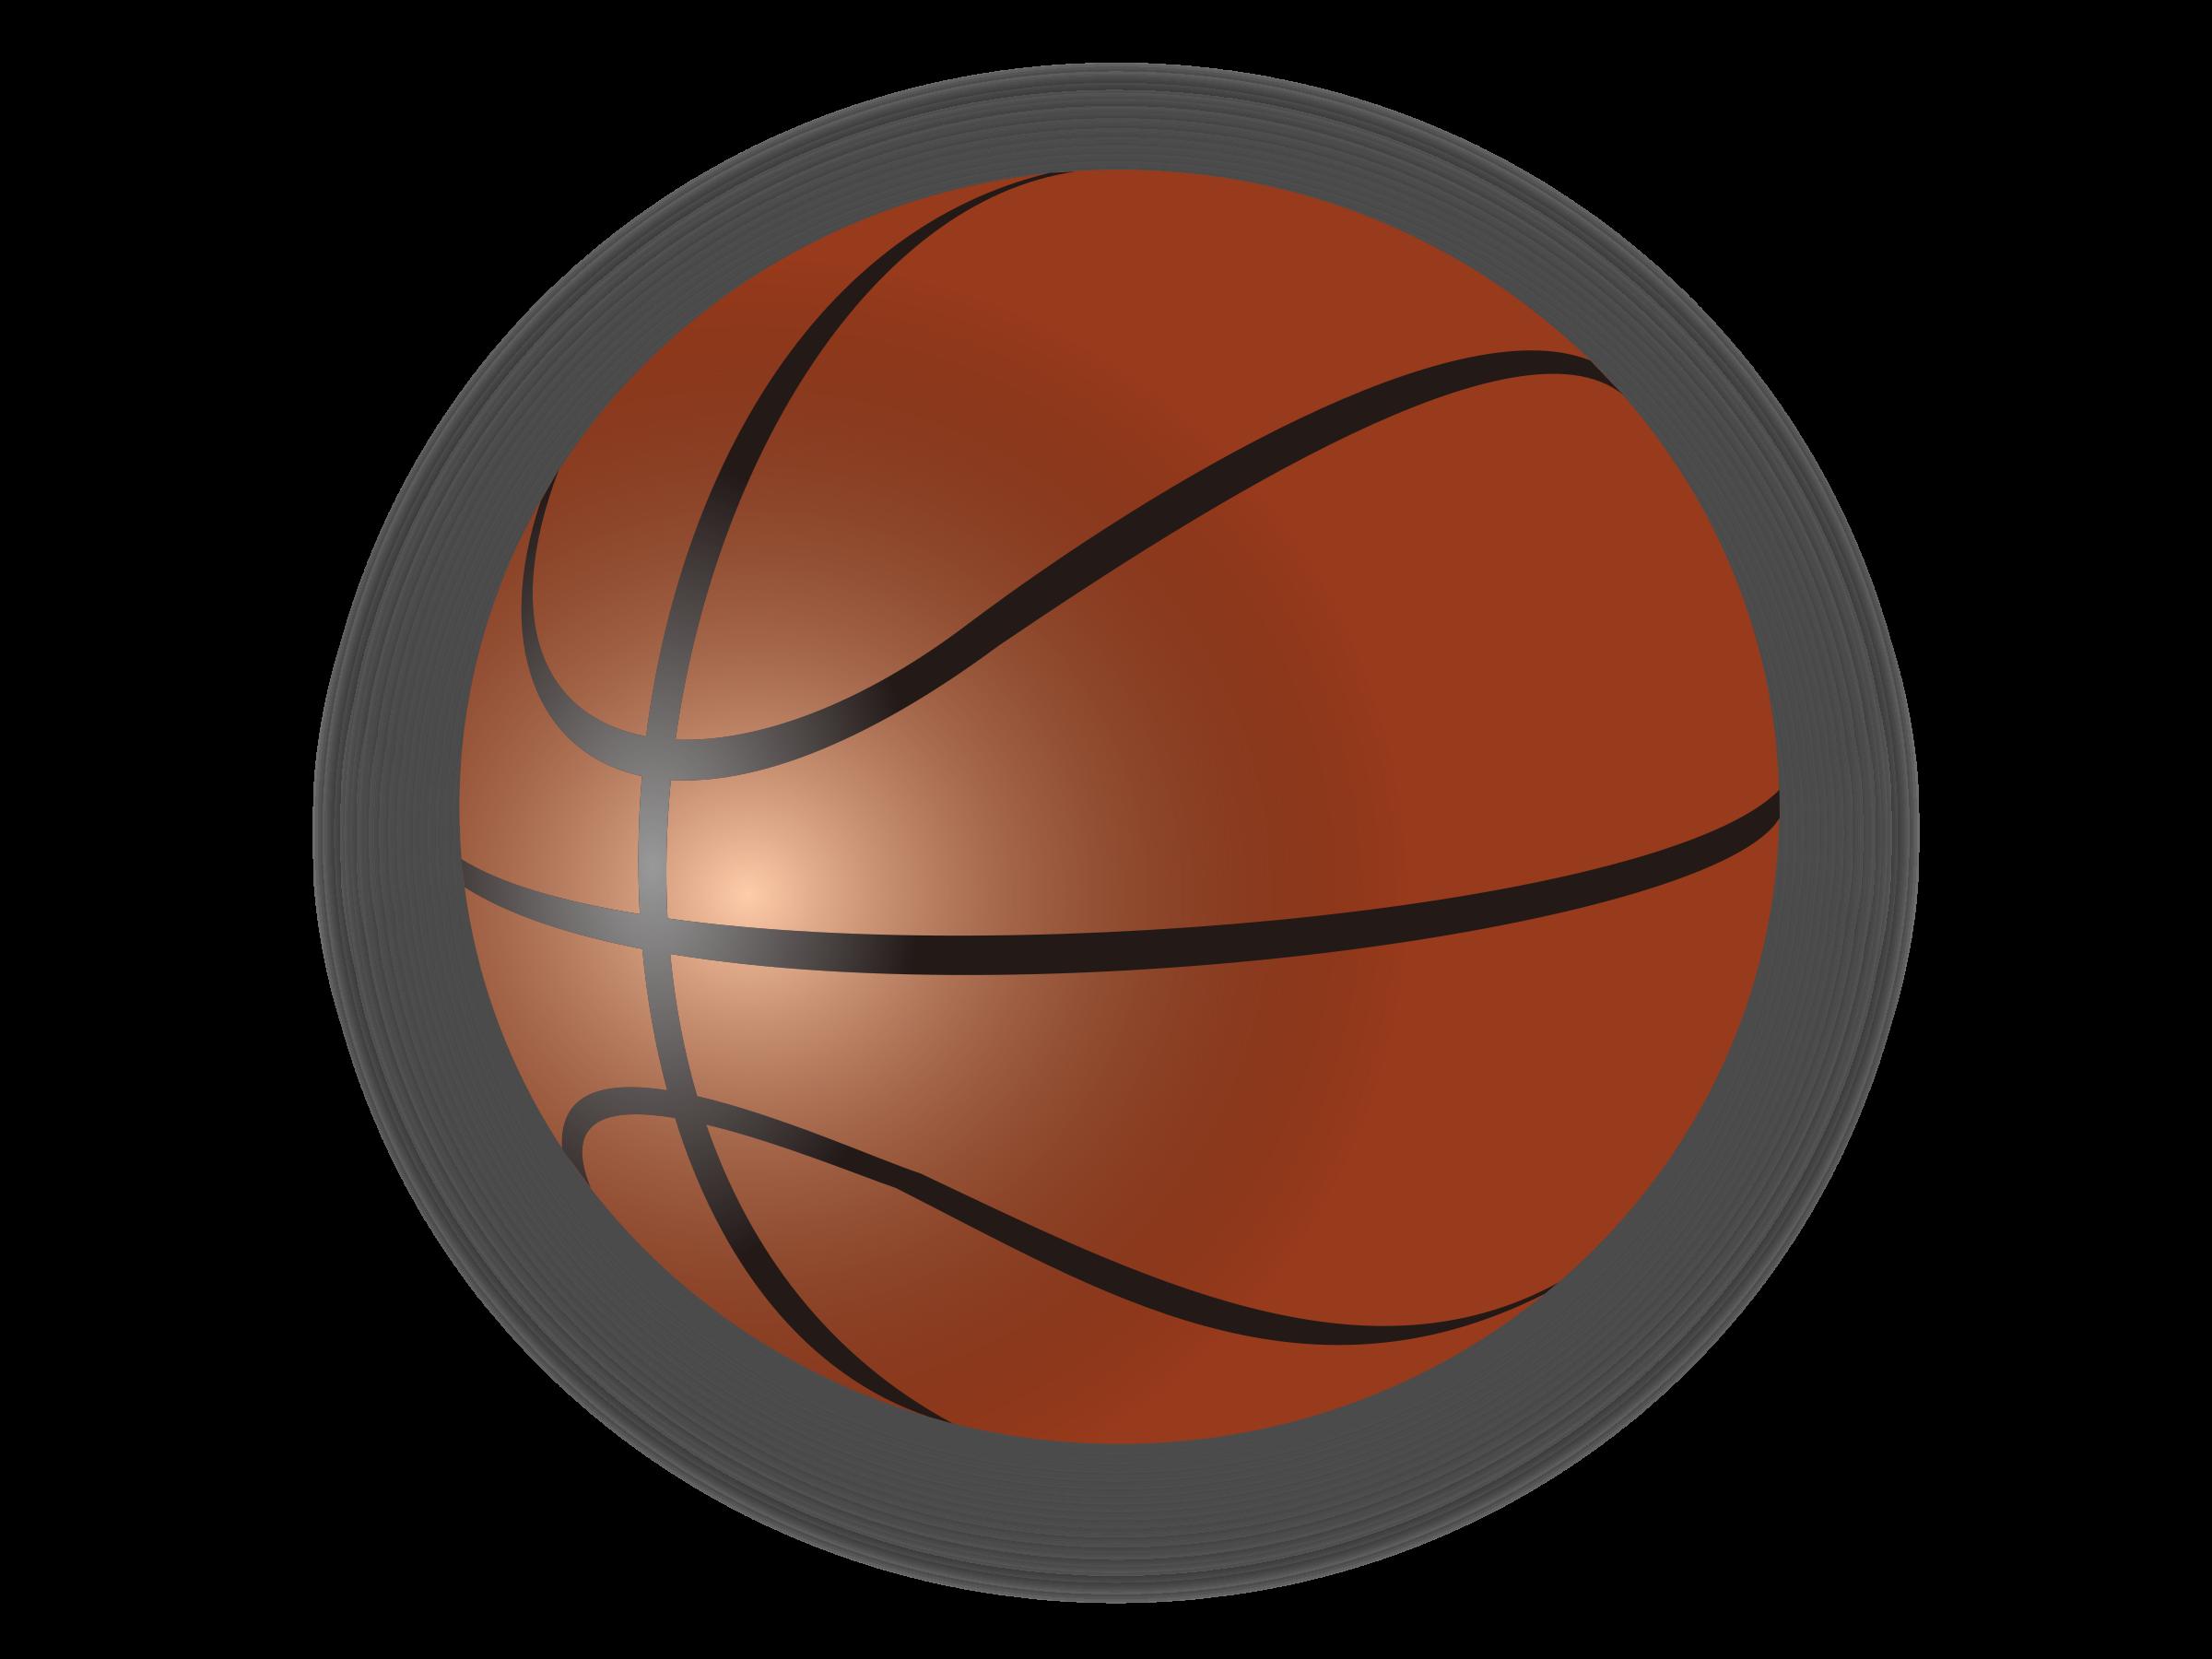 PNG File Name: Sports Basketb